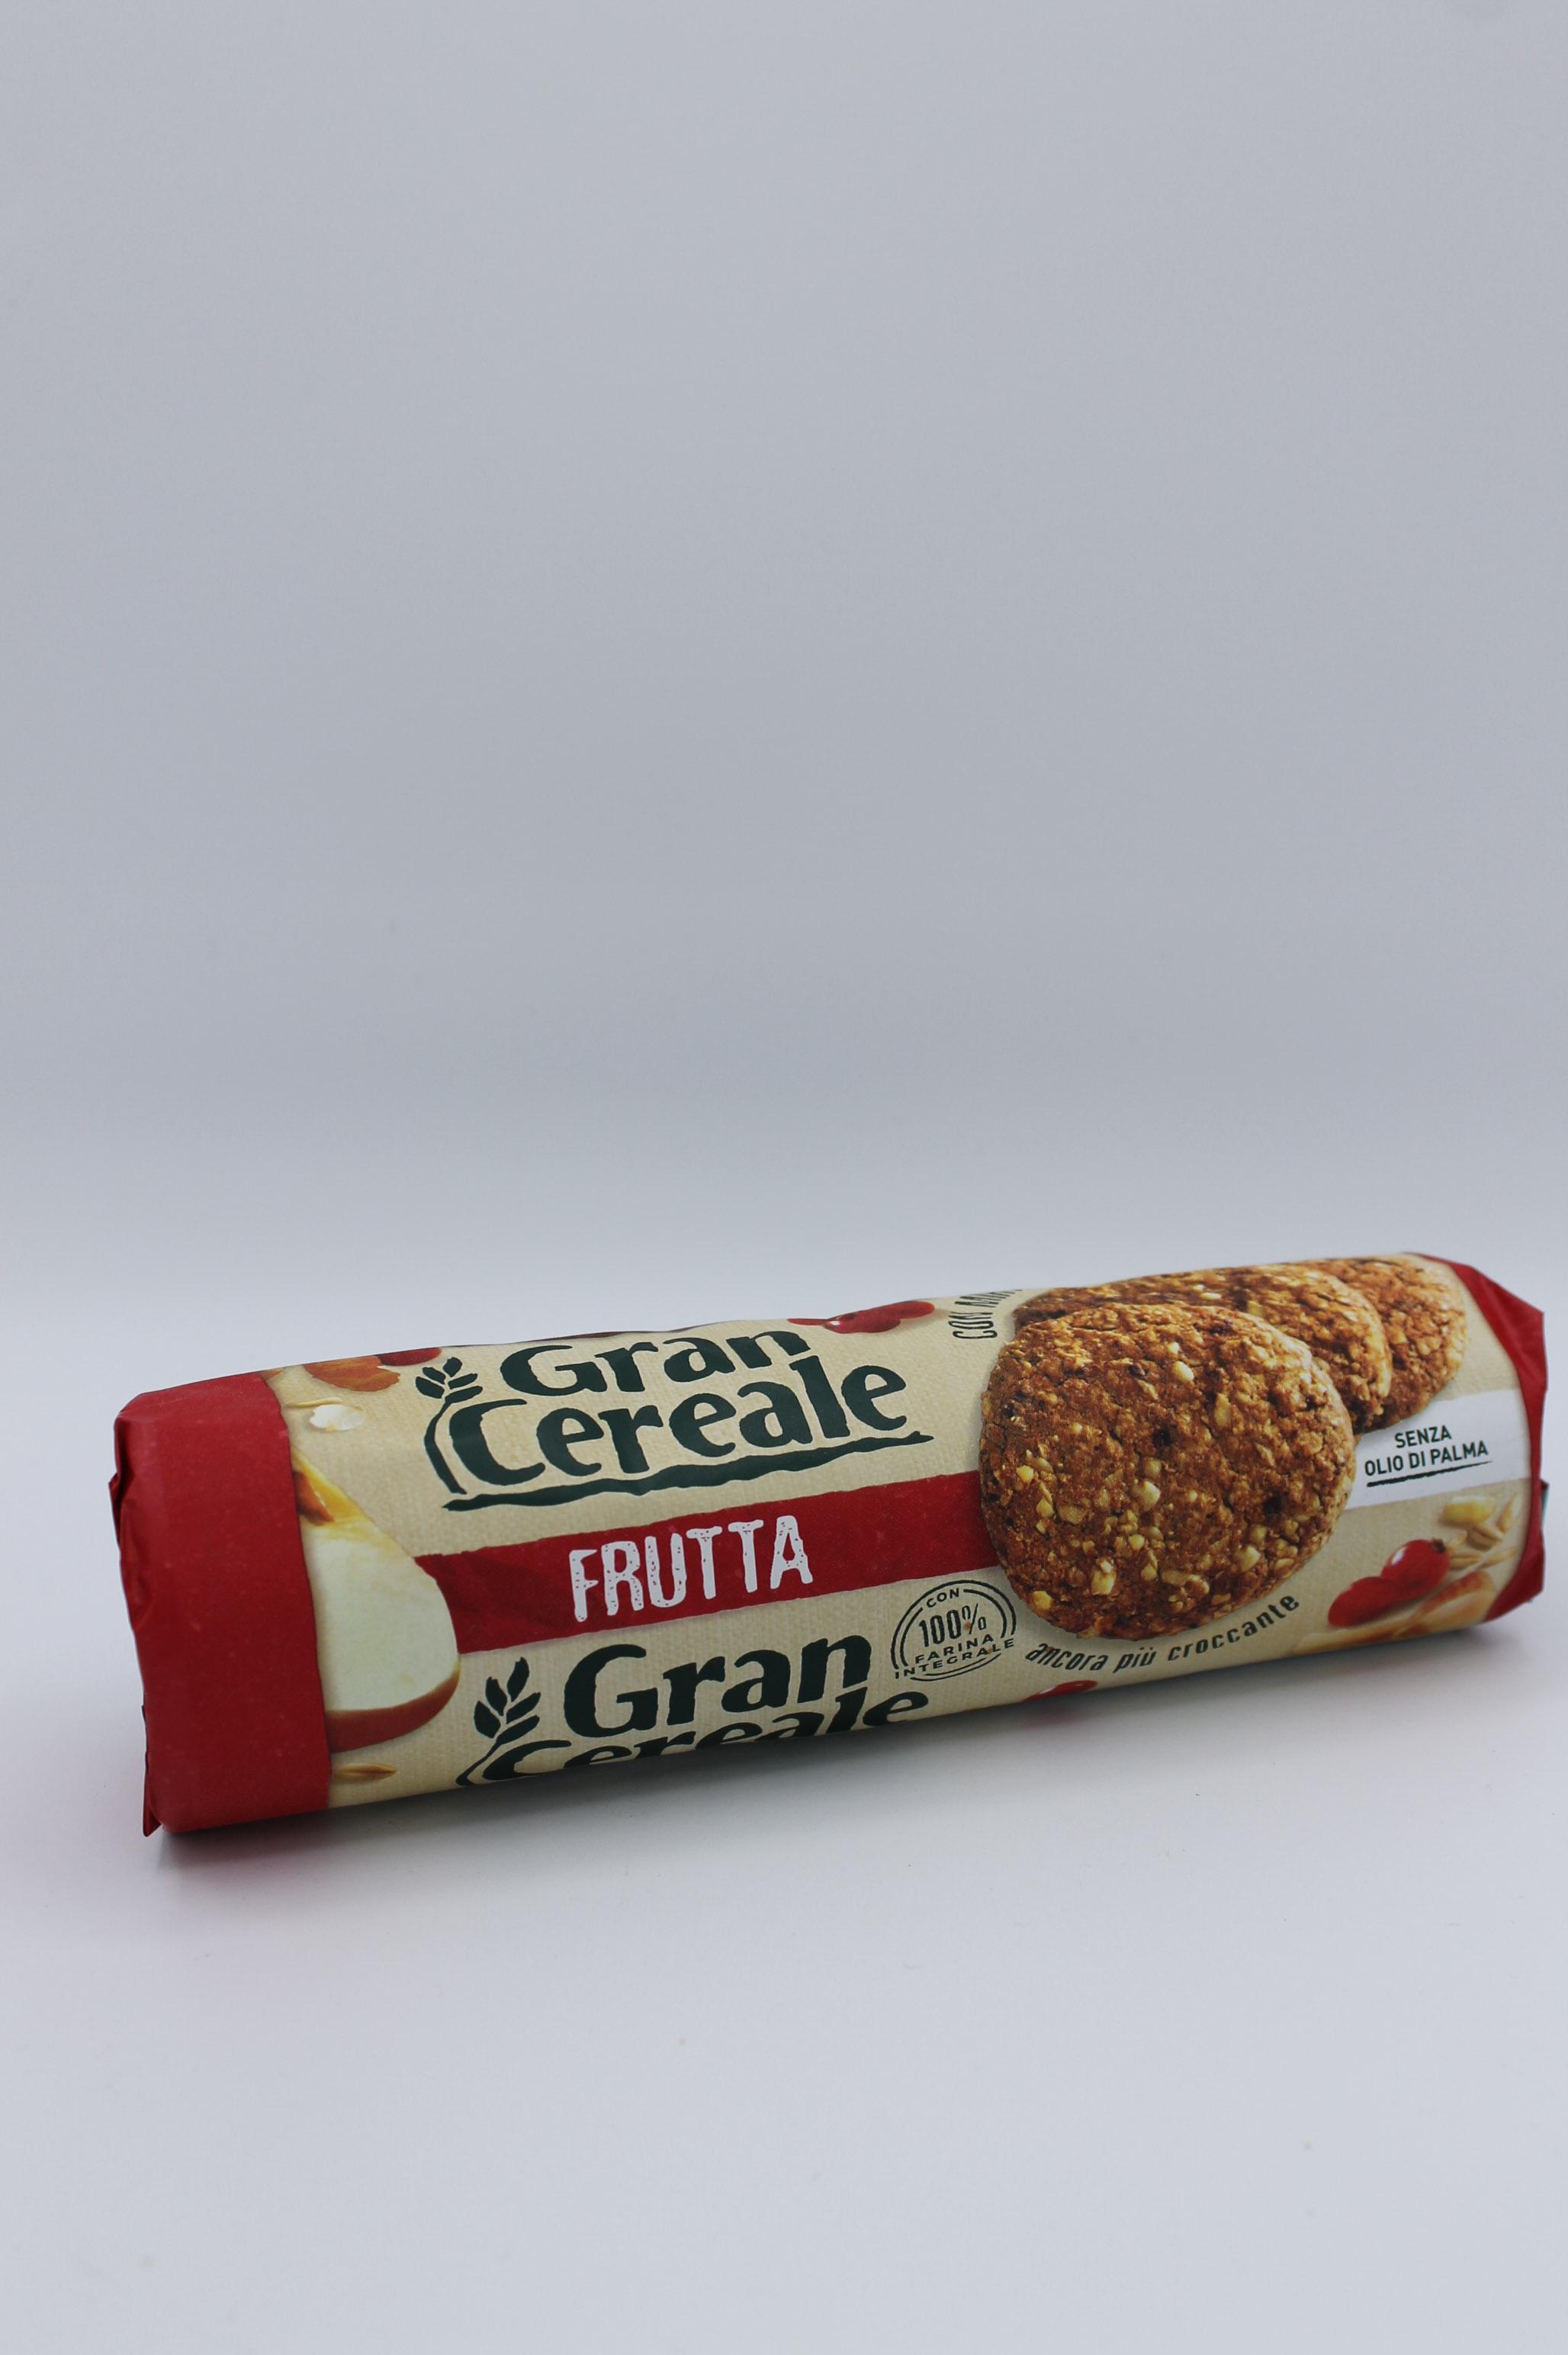 Mulino bianco biscotti gran cereale 250 gr vari gusti.